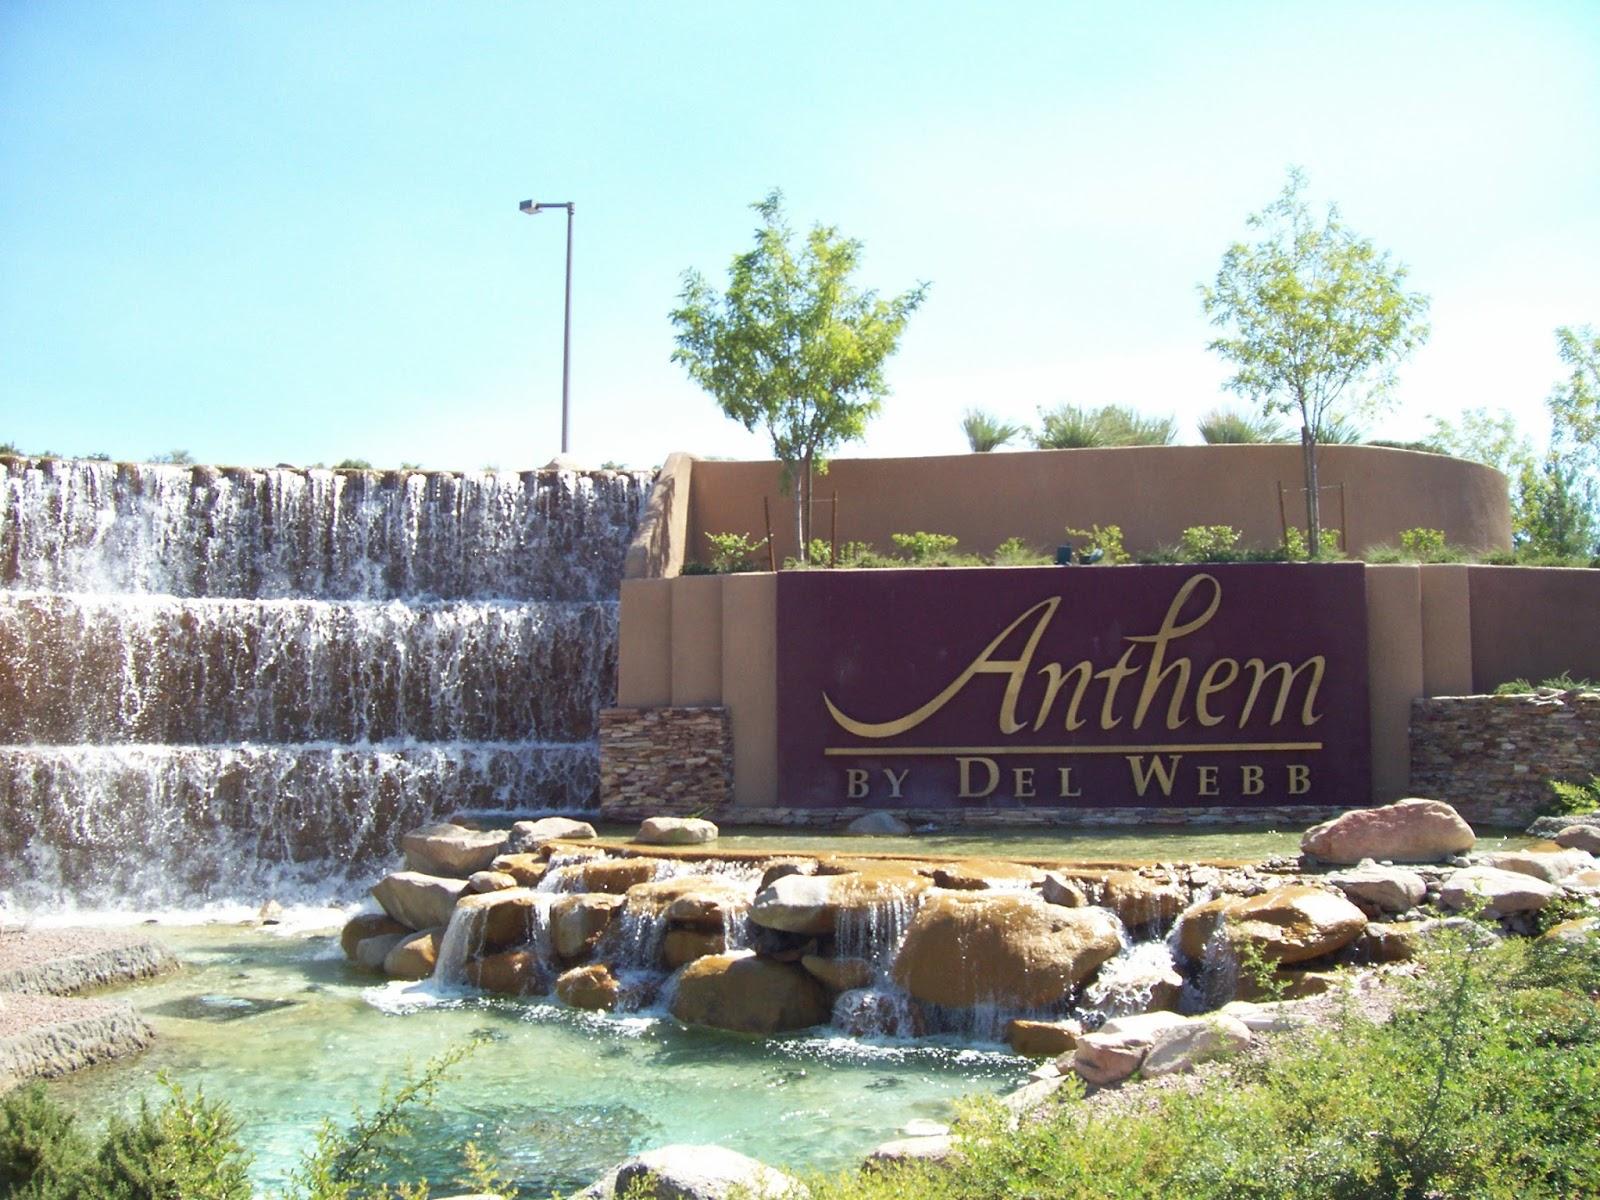 Kitchen Remodel Las Vegas Lights For Over Table Sun City Henderson 太阳城概述 拉斯维加斯超级豪华退休的 拉斯维加斯超级豪华退休的房子仅 199k 开始